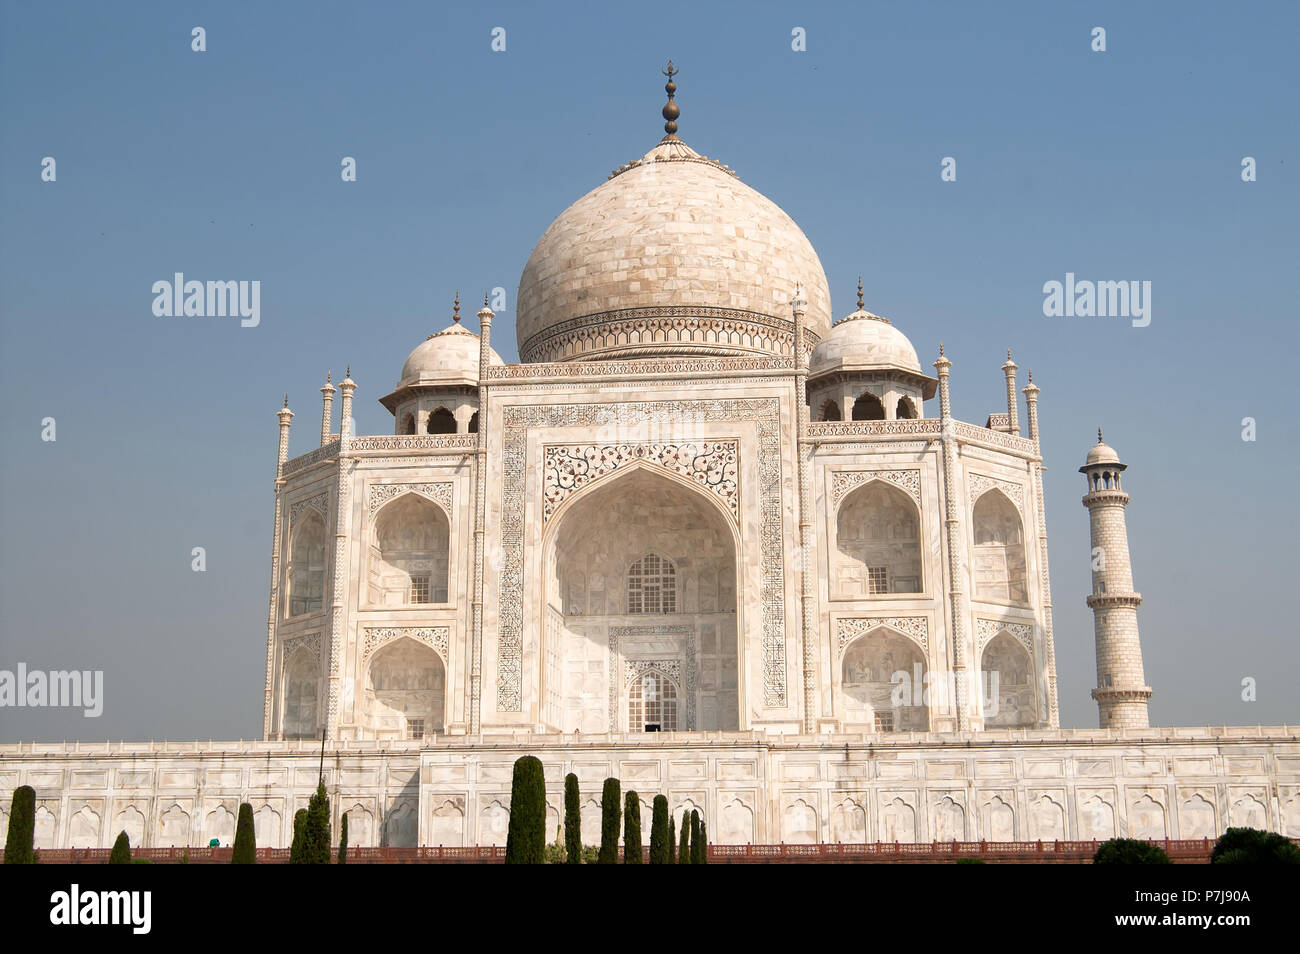 White marble Taj Mahal in India, Agra - Stock Image